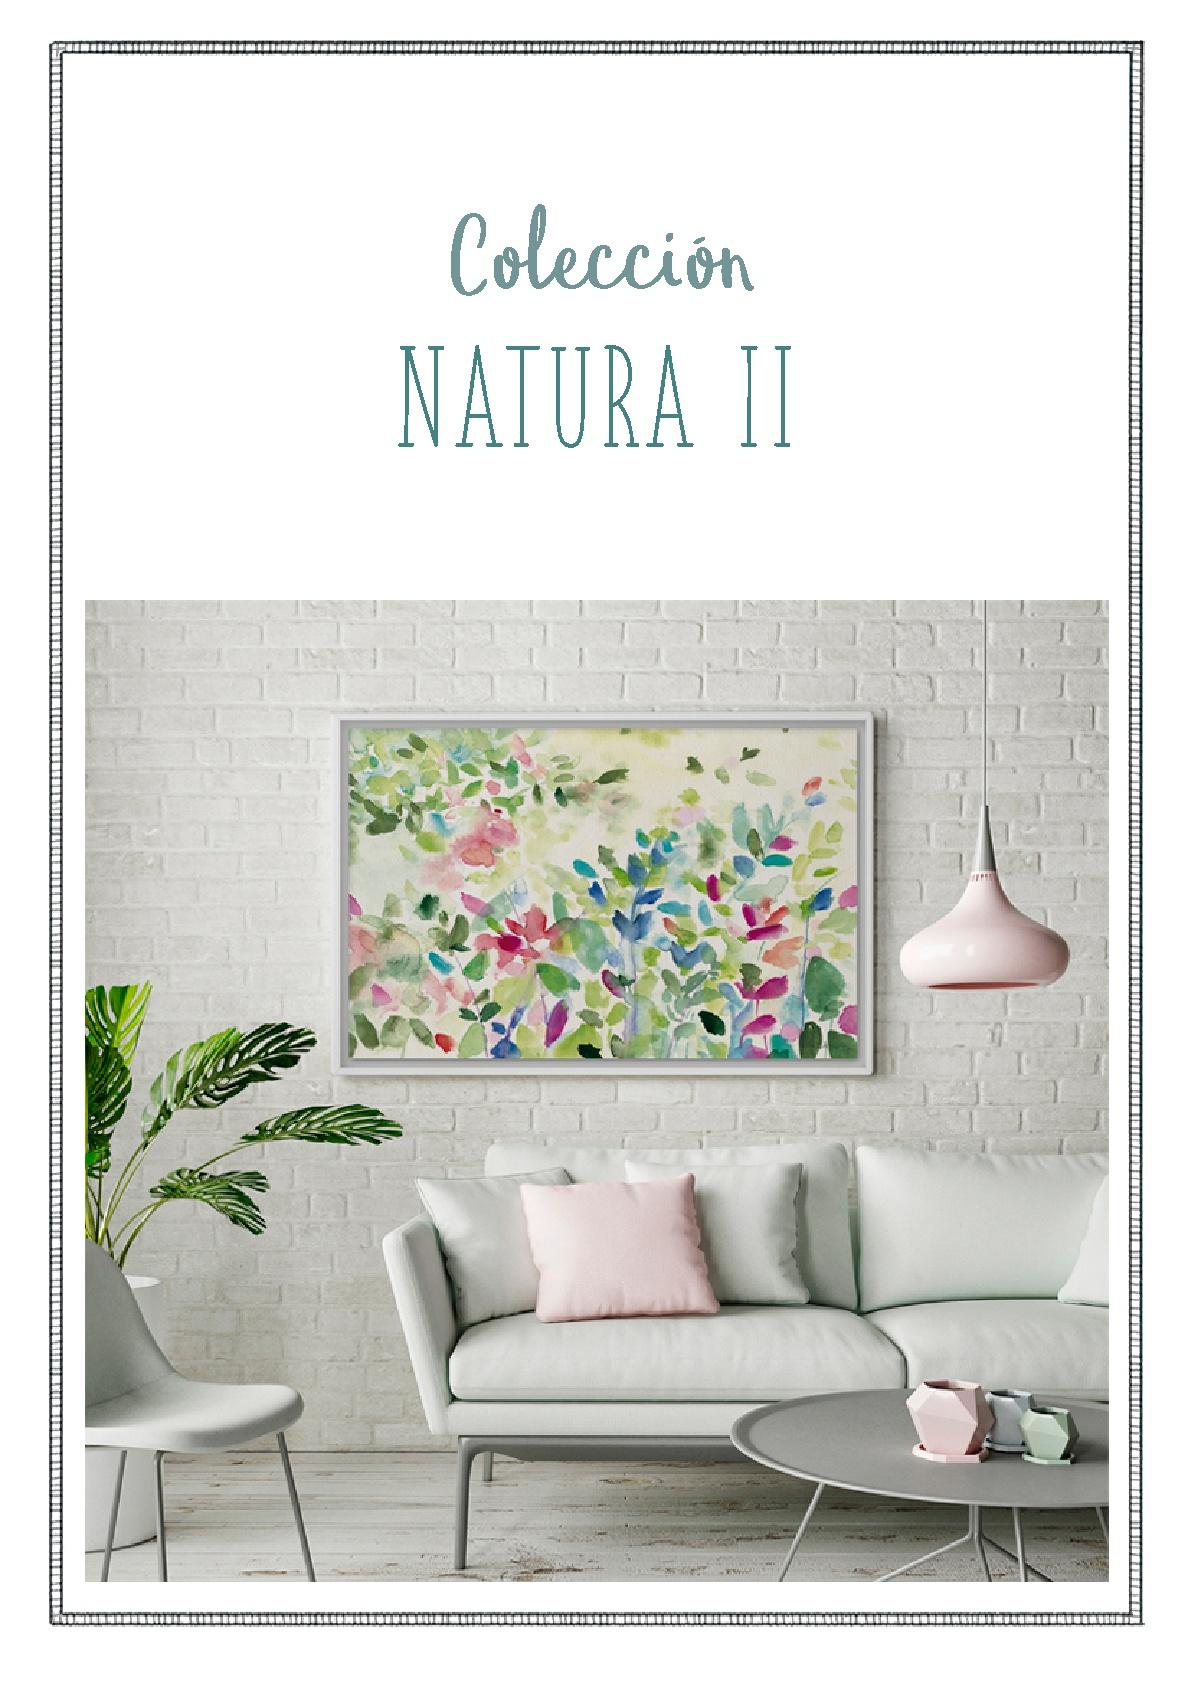 NATURA II 001 - Natura II